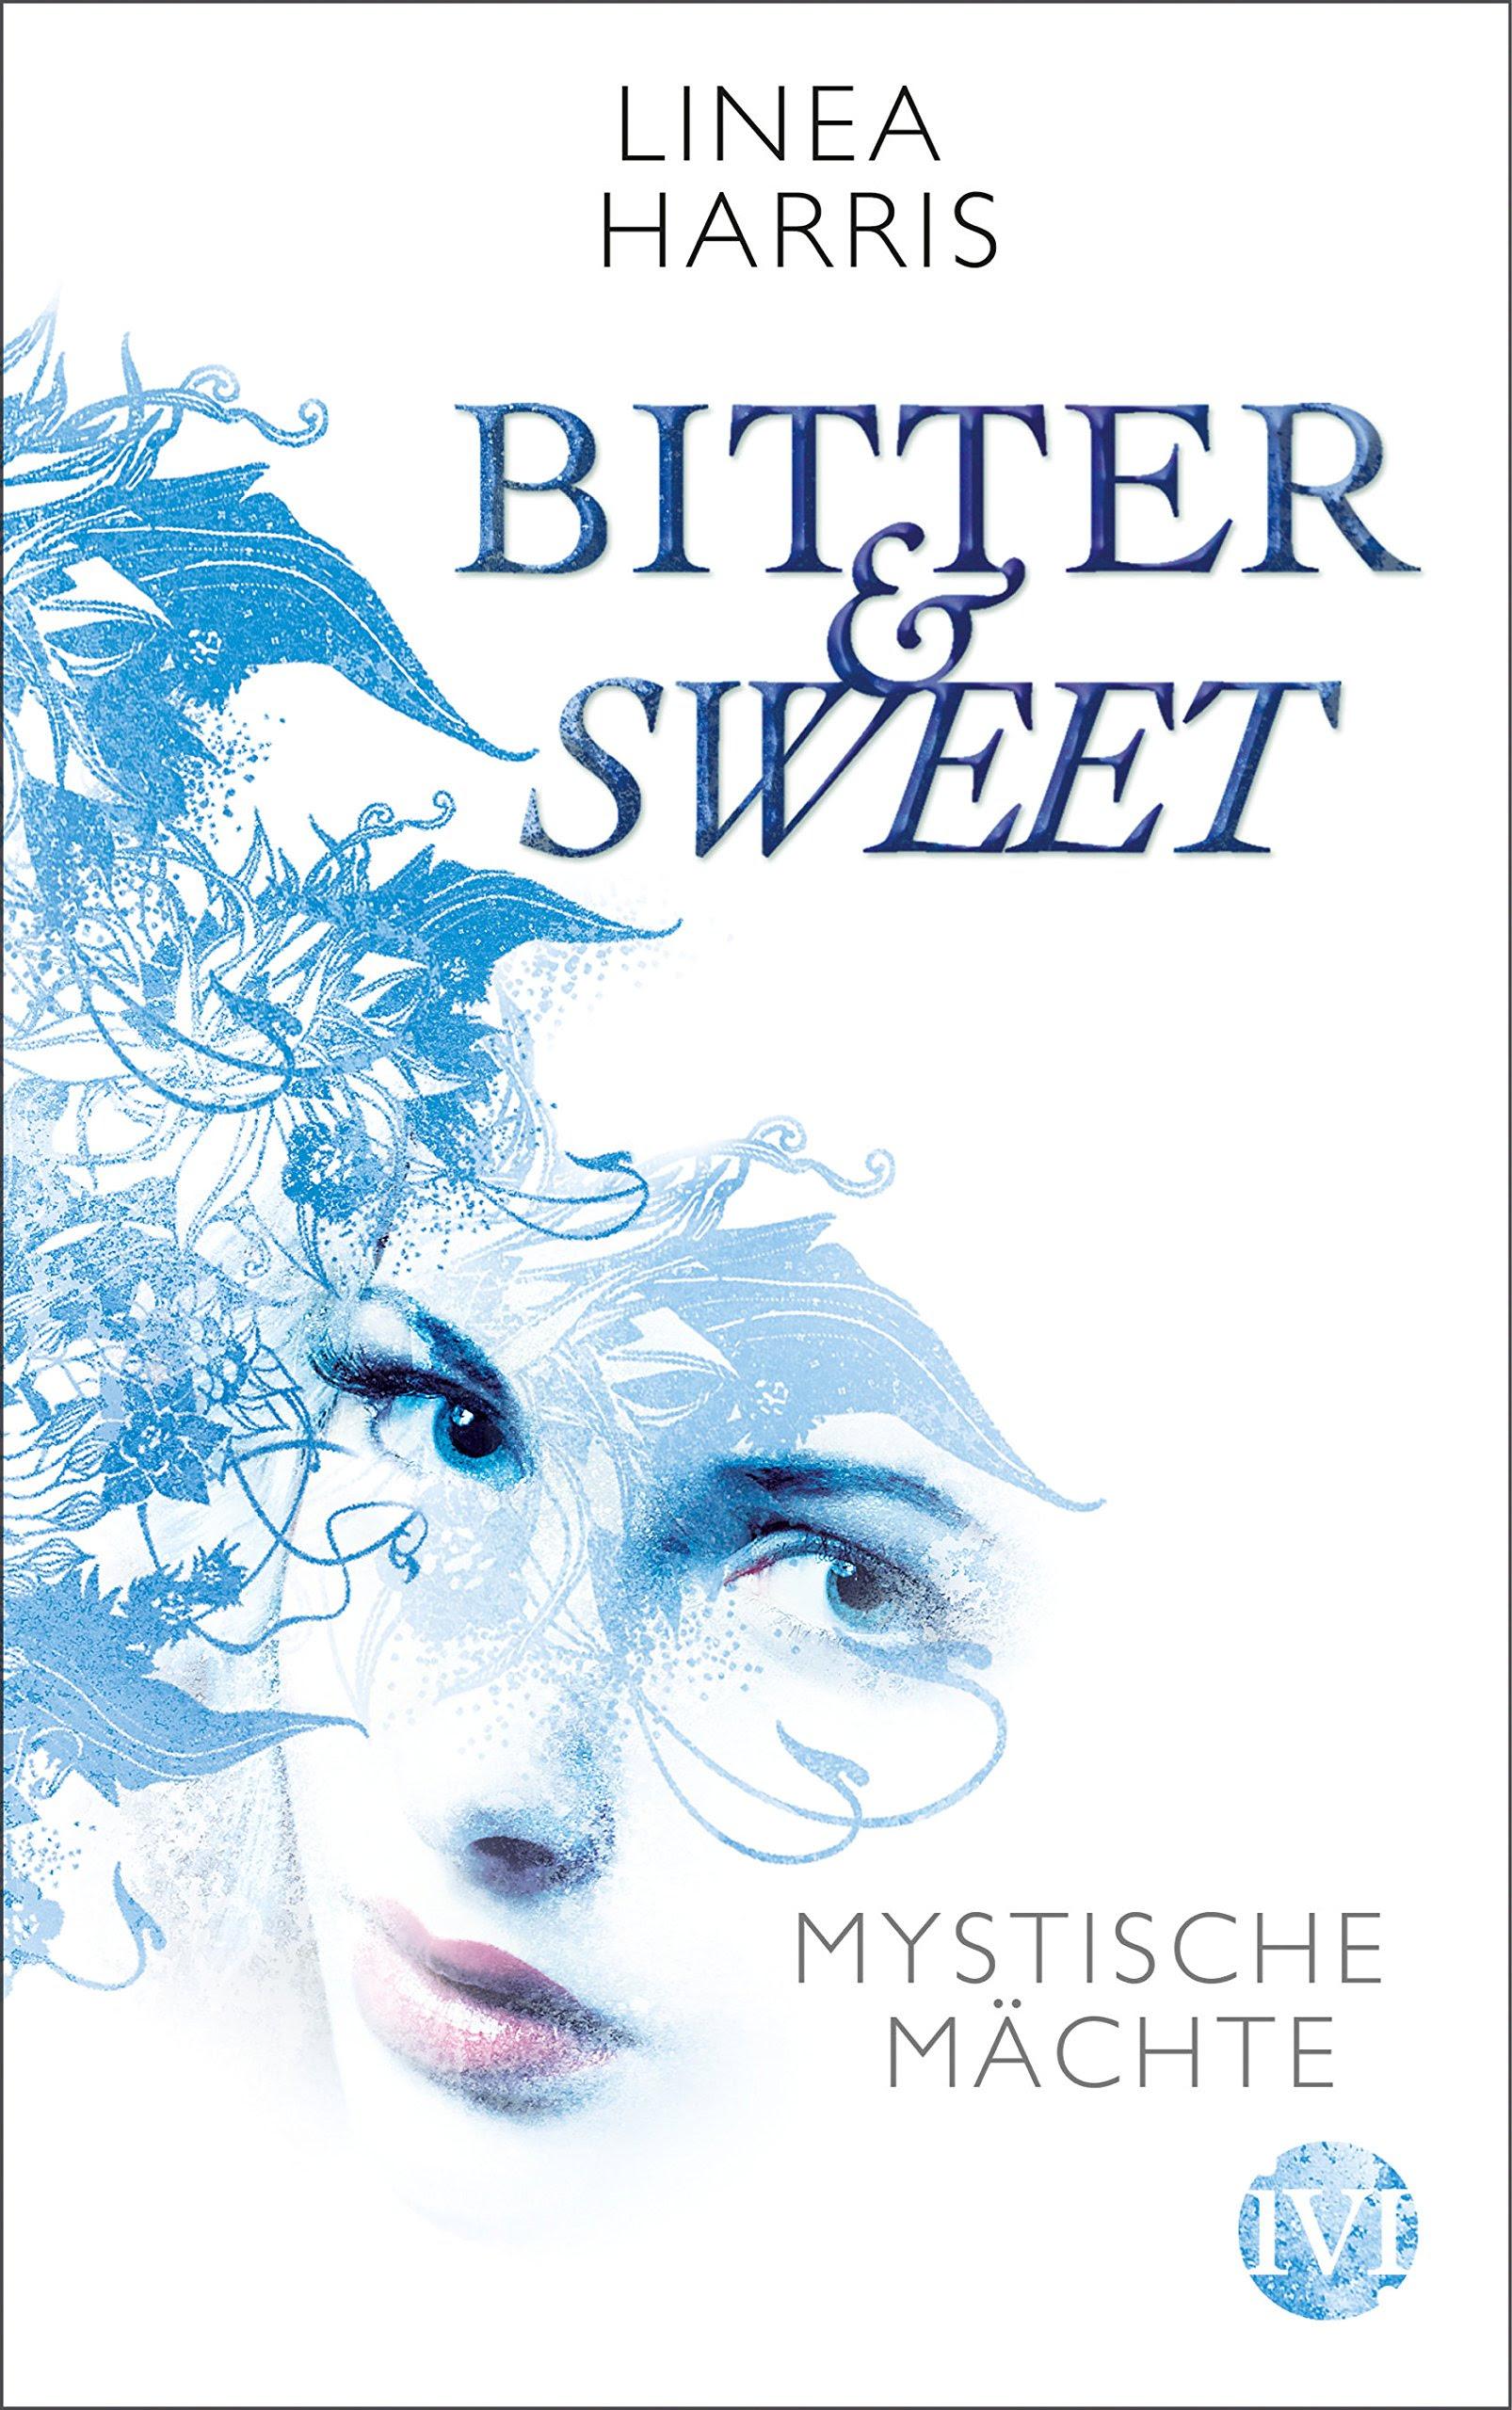 http://www.piper.de/buecher/mystische-maechte-isbn-978-3-492-70421-2